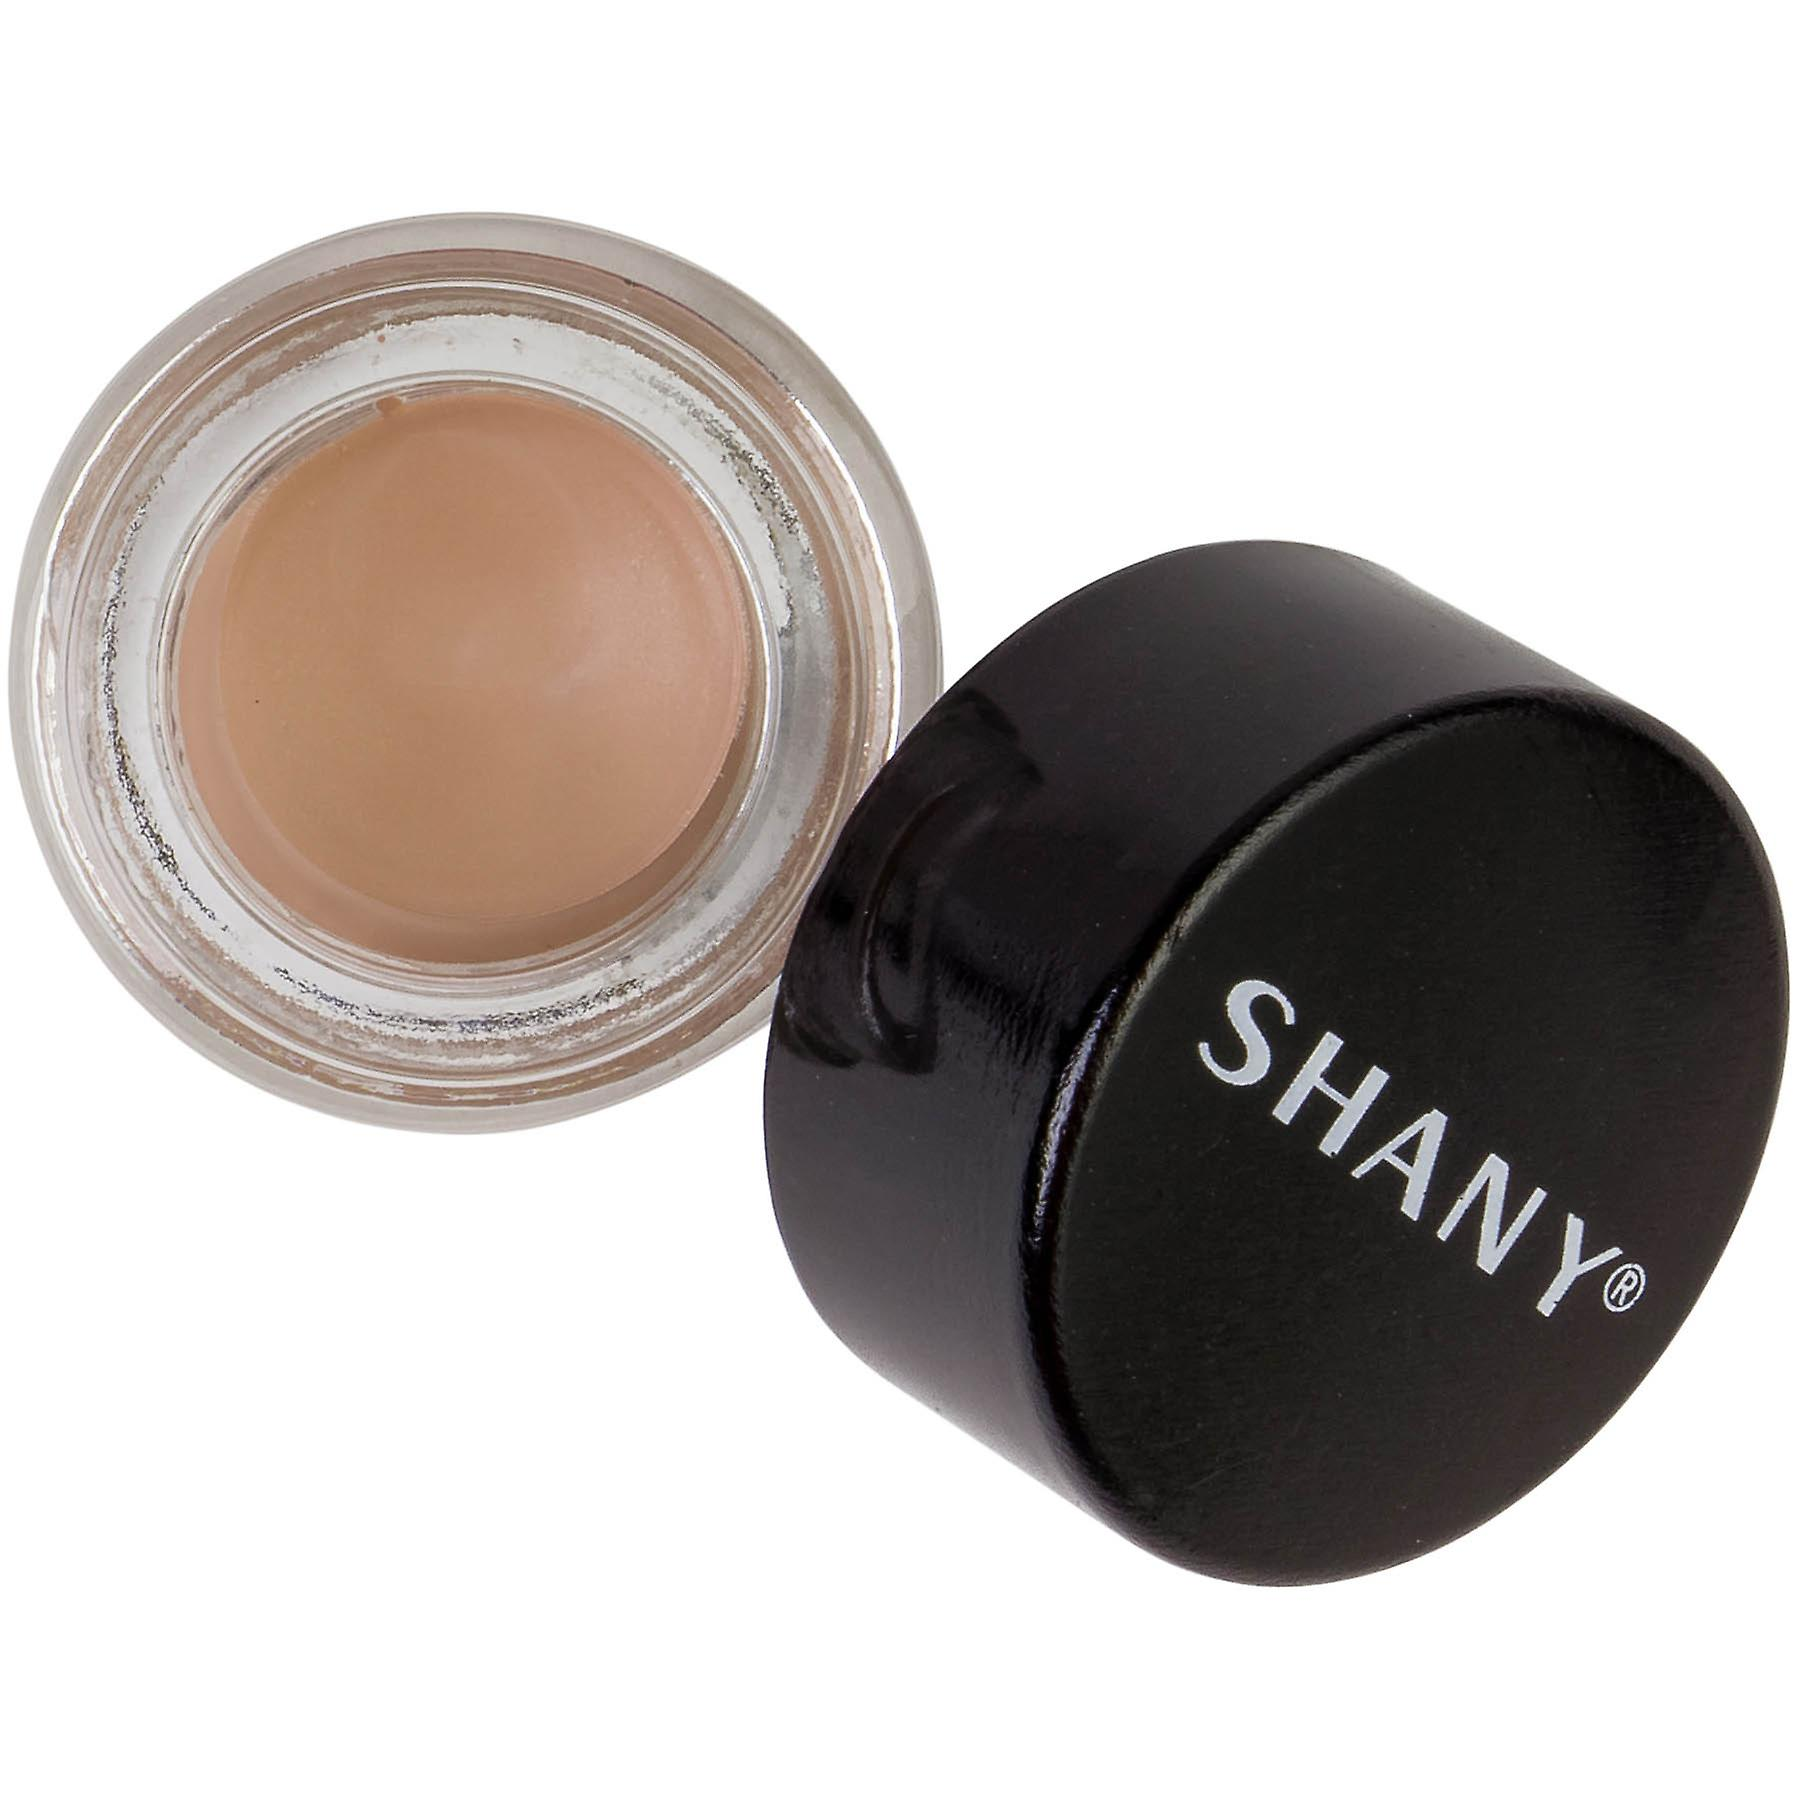 SHANY EYE & LIP Primer/Base - Paraben Free/Talc Free - Waterproof